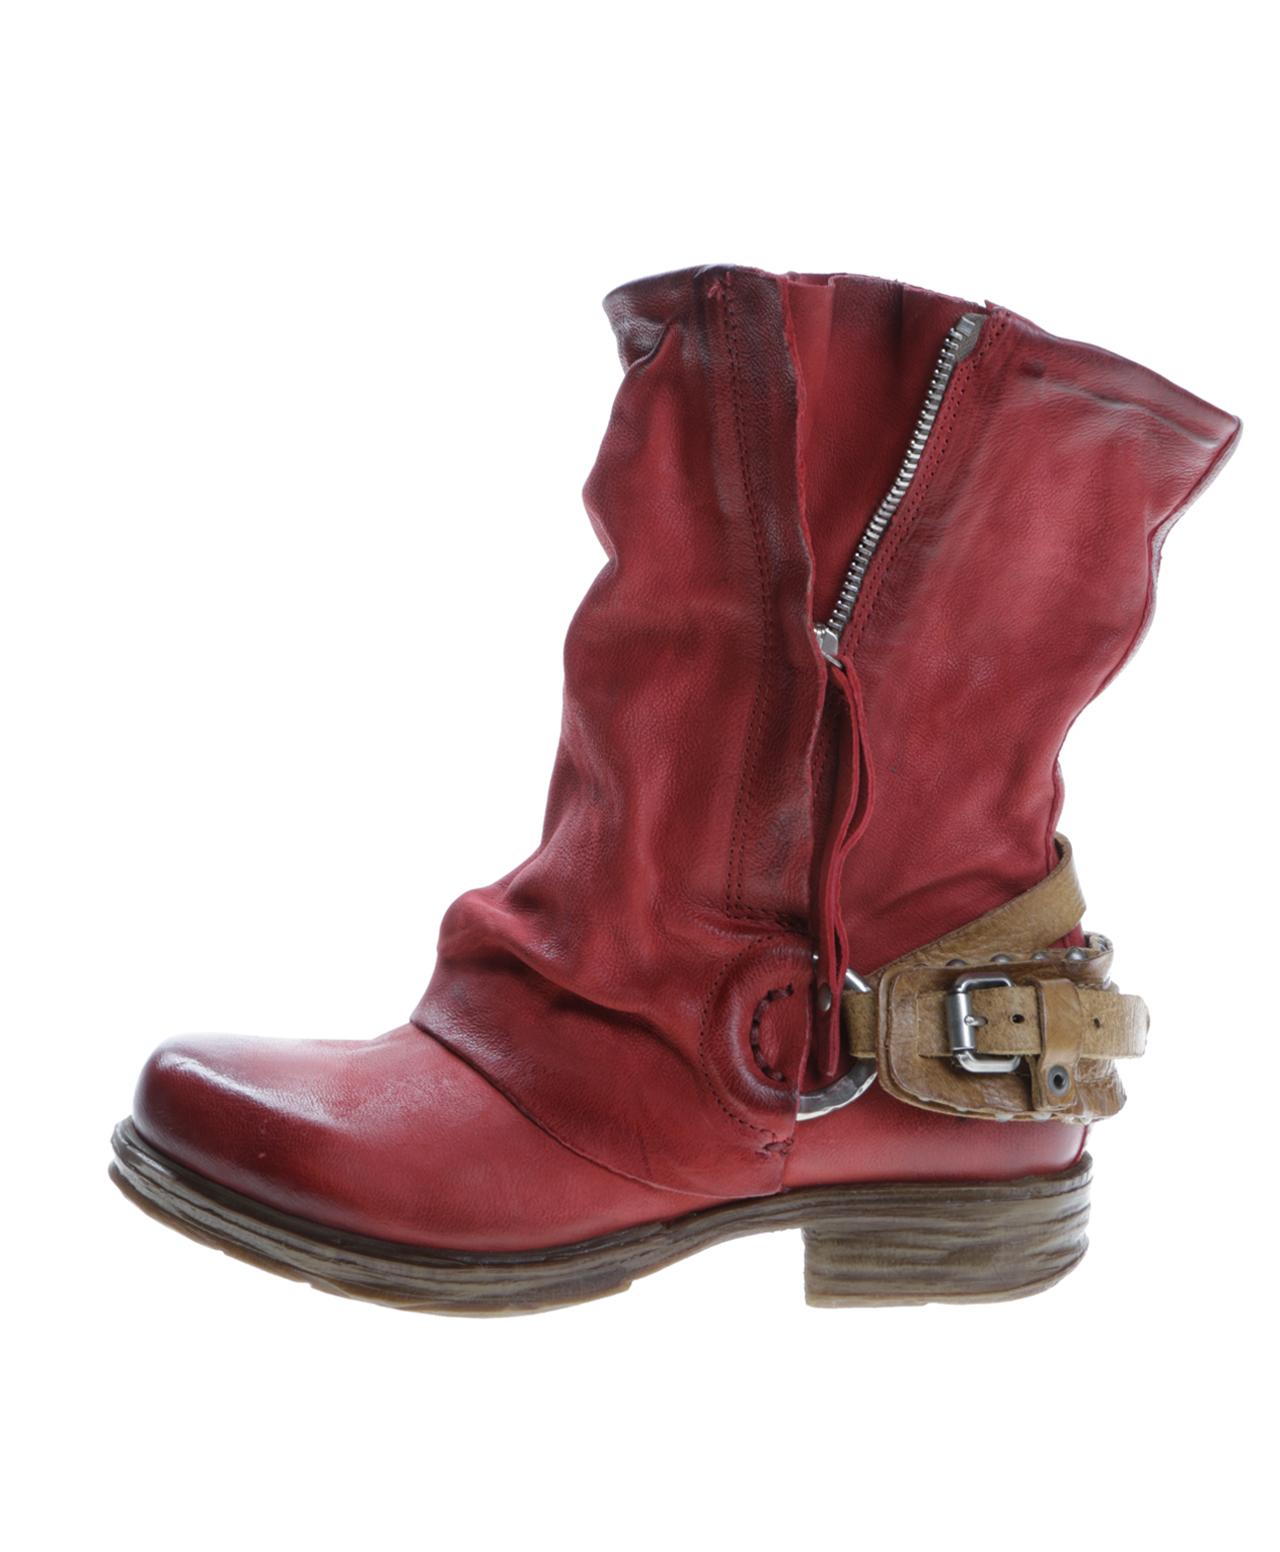 buy popular 12c87 1b9e8 Damen Stiefelette 259214